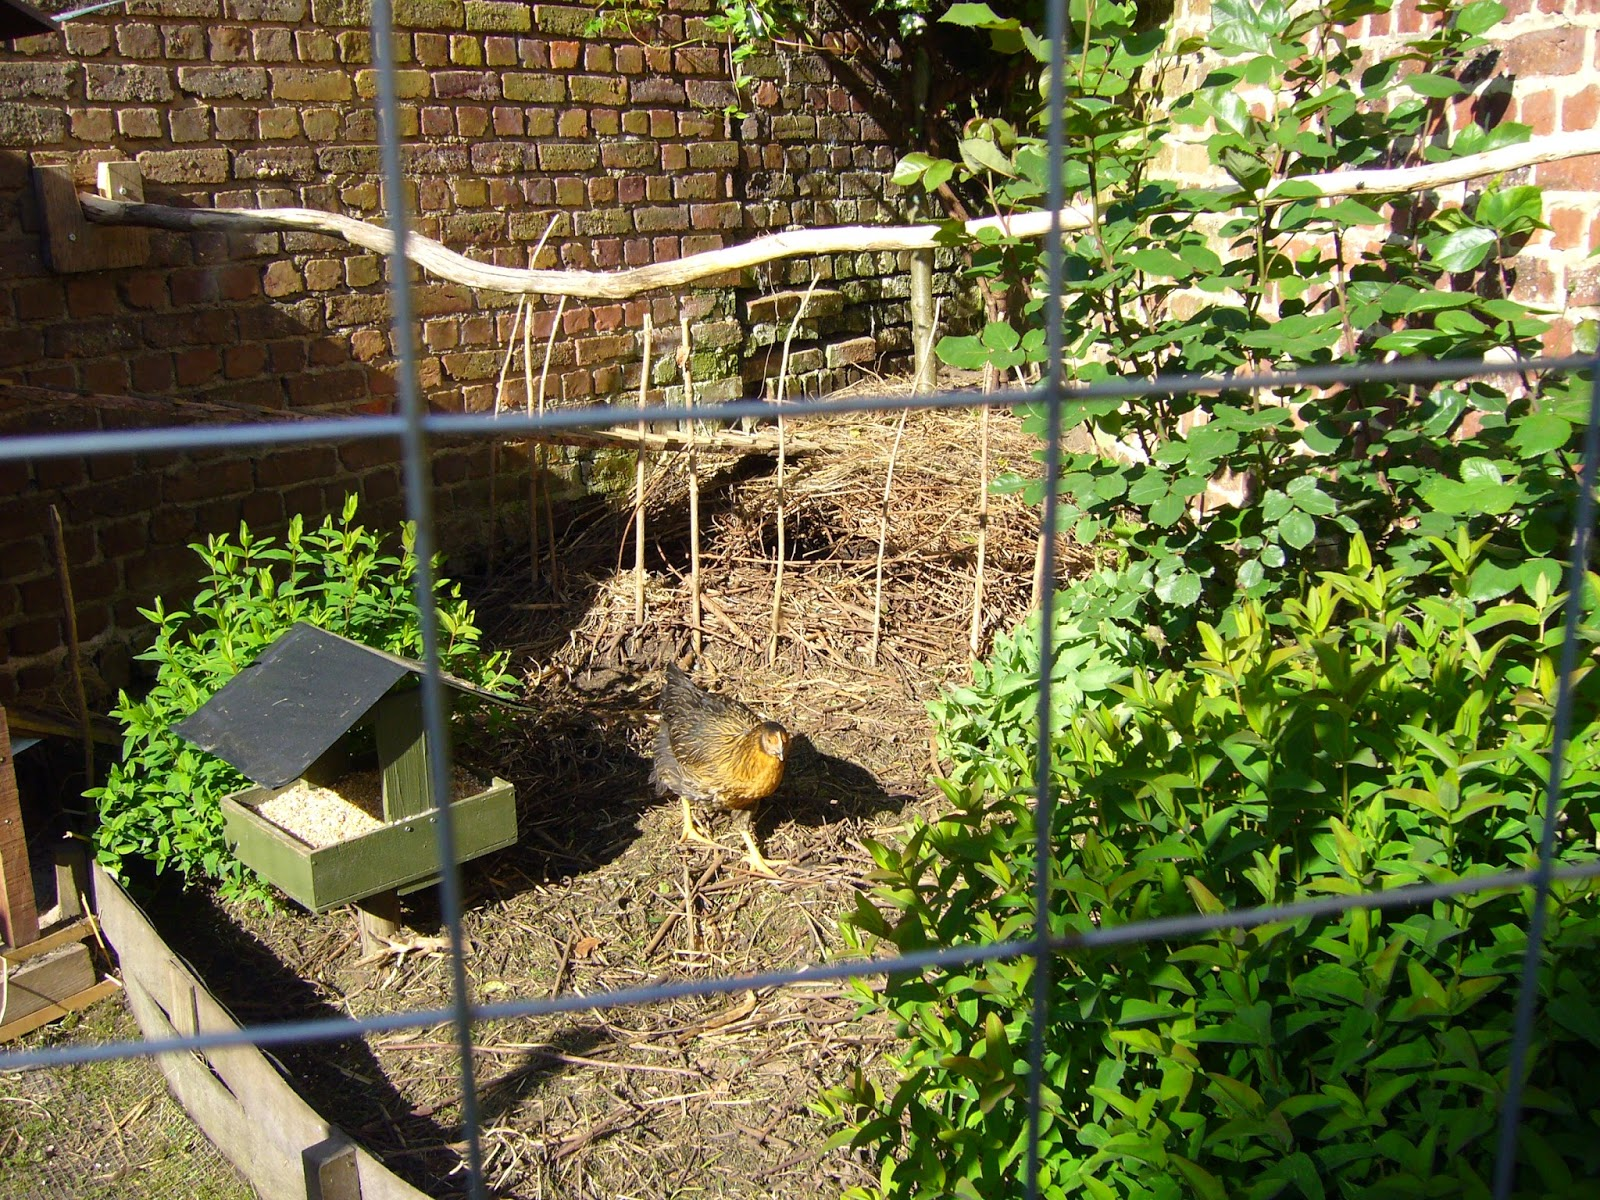 Jardin potager comestible partager mai 2015 for Jardin potager 2015